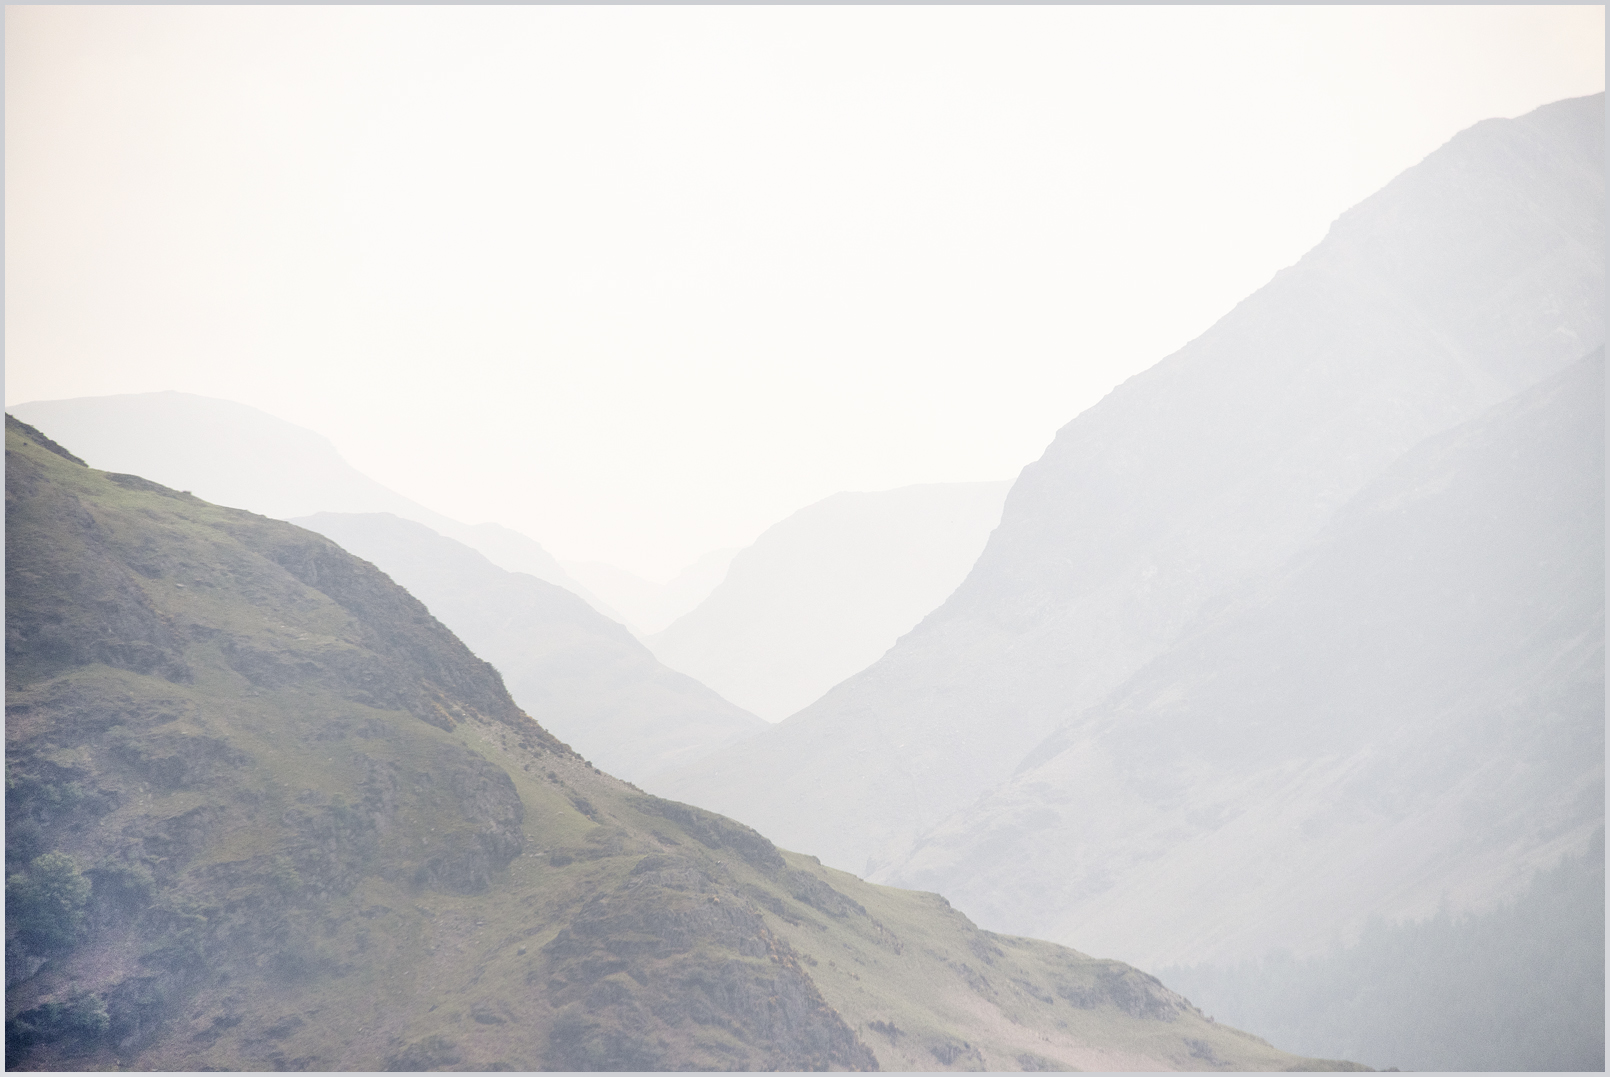 Ullswater mountains